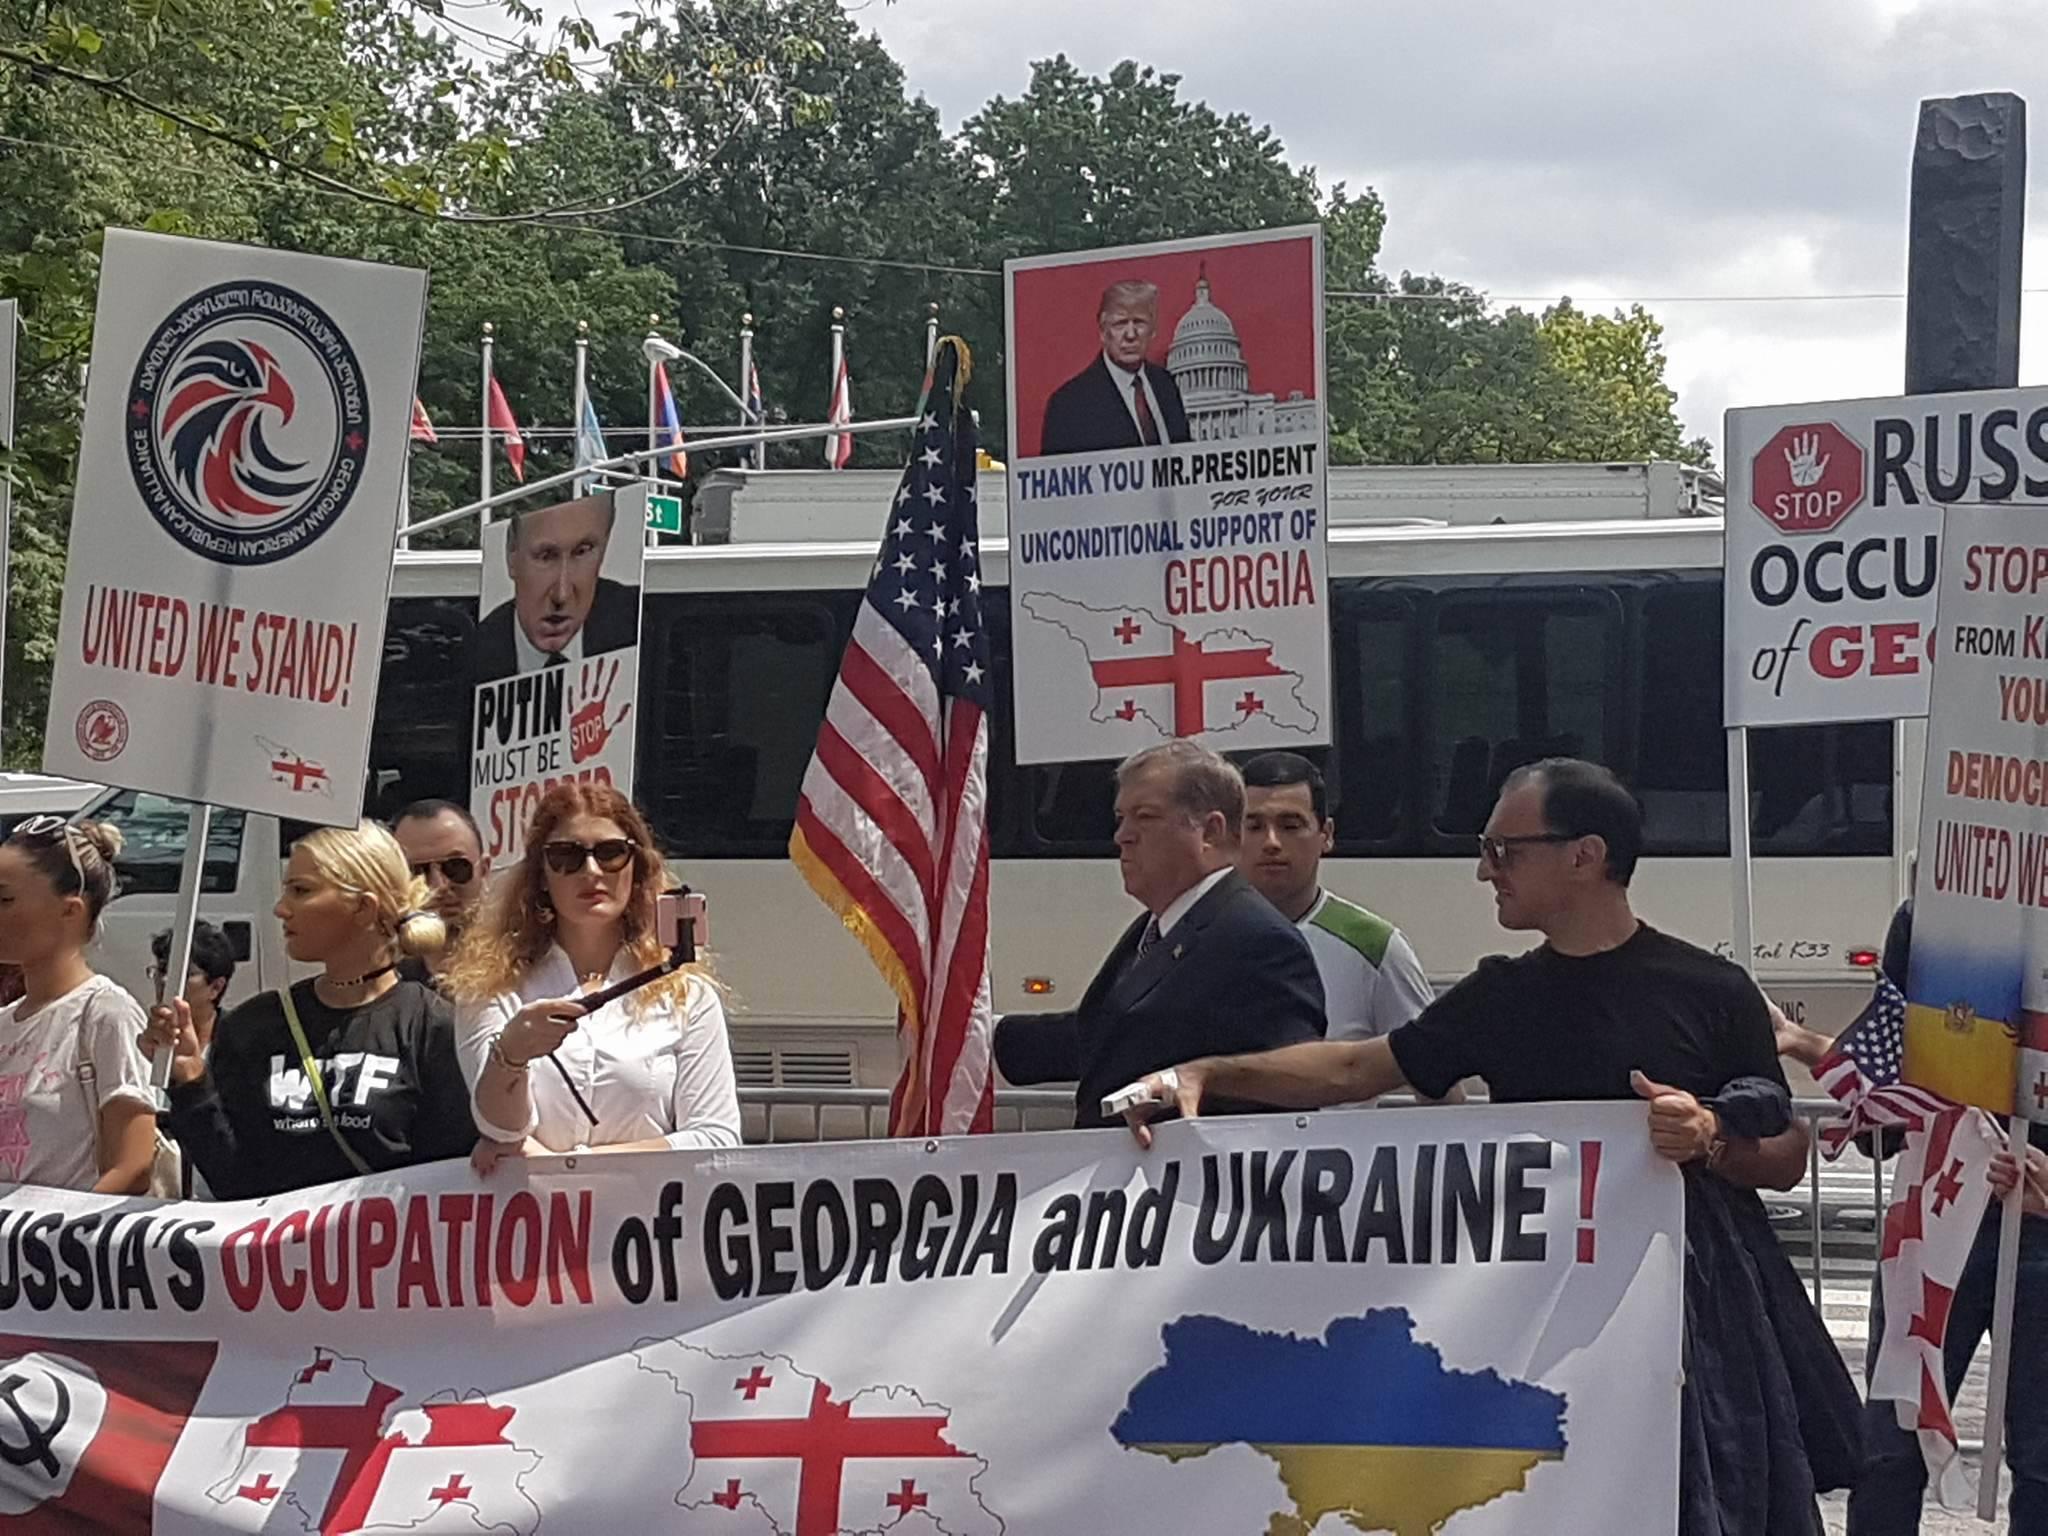 Stop Russia - აქცია ნიუ იორკში, აშშ. ფოტო:  ირაკლი გაბუნია